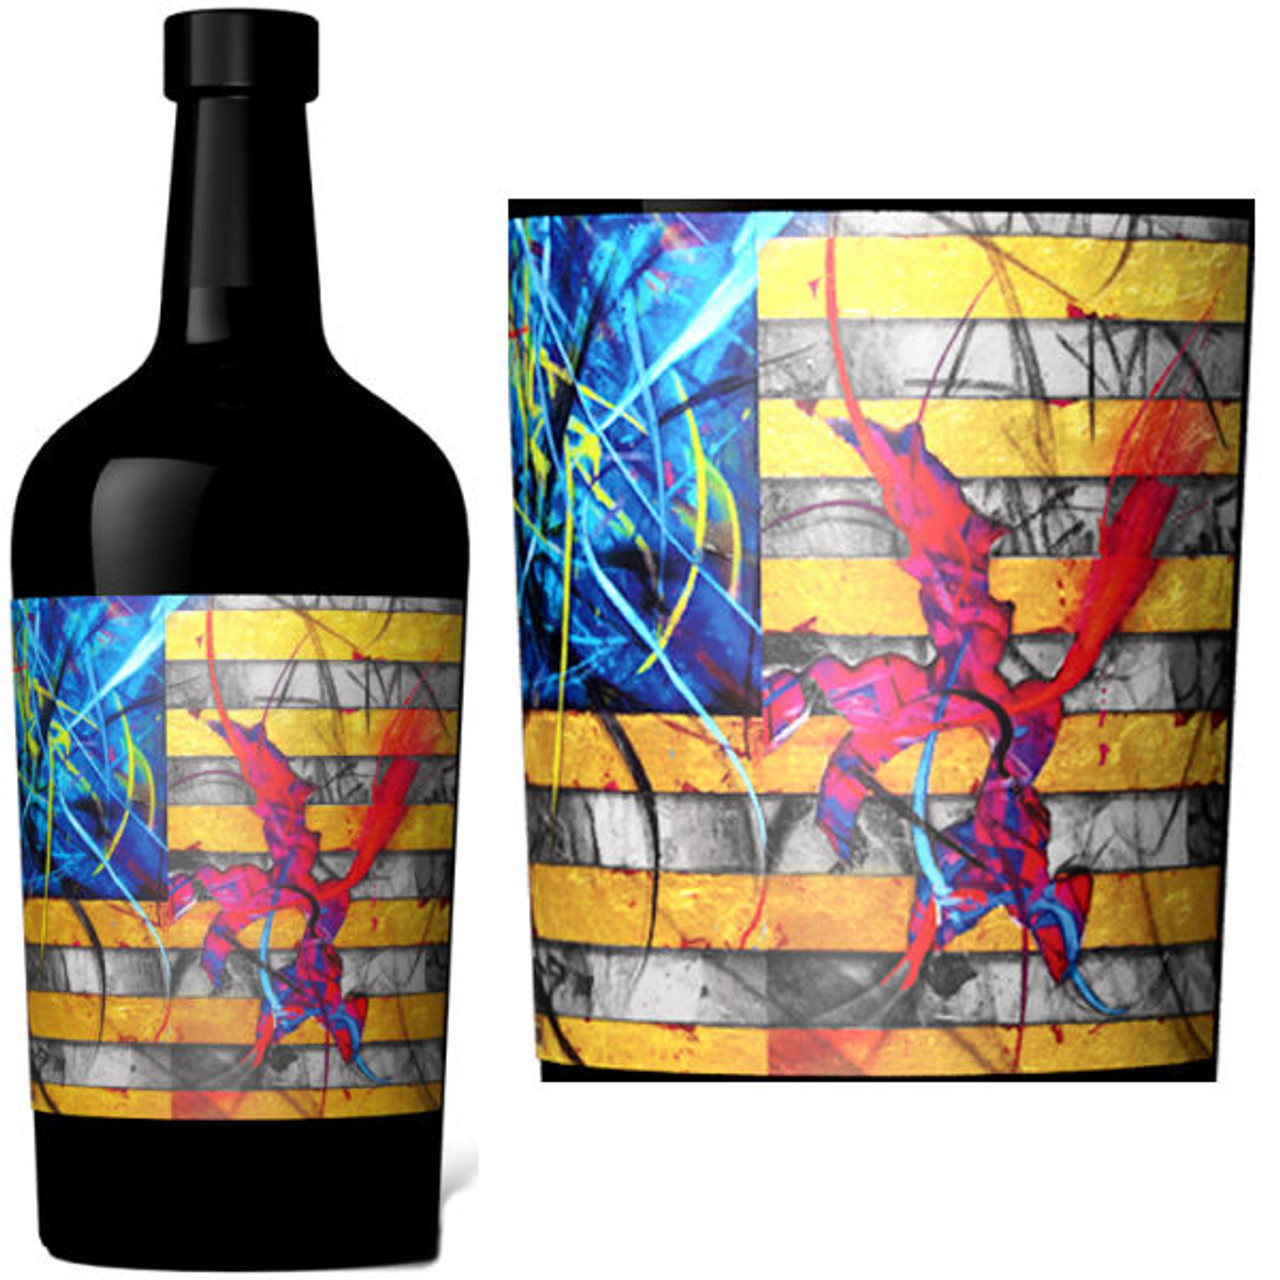 new style 48864 d399c 1849 Wine Company Triumph Sonoma Red Blend 2015